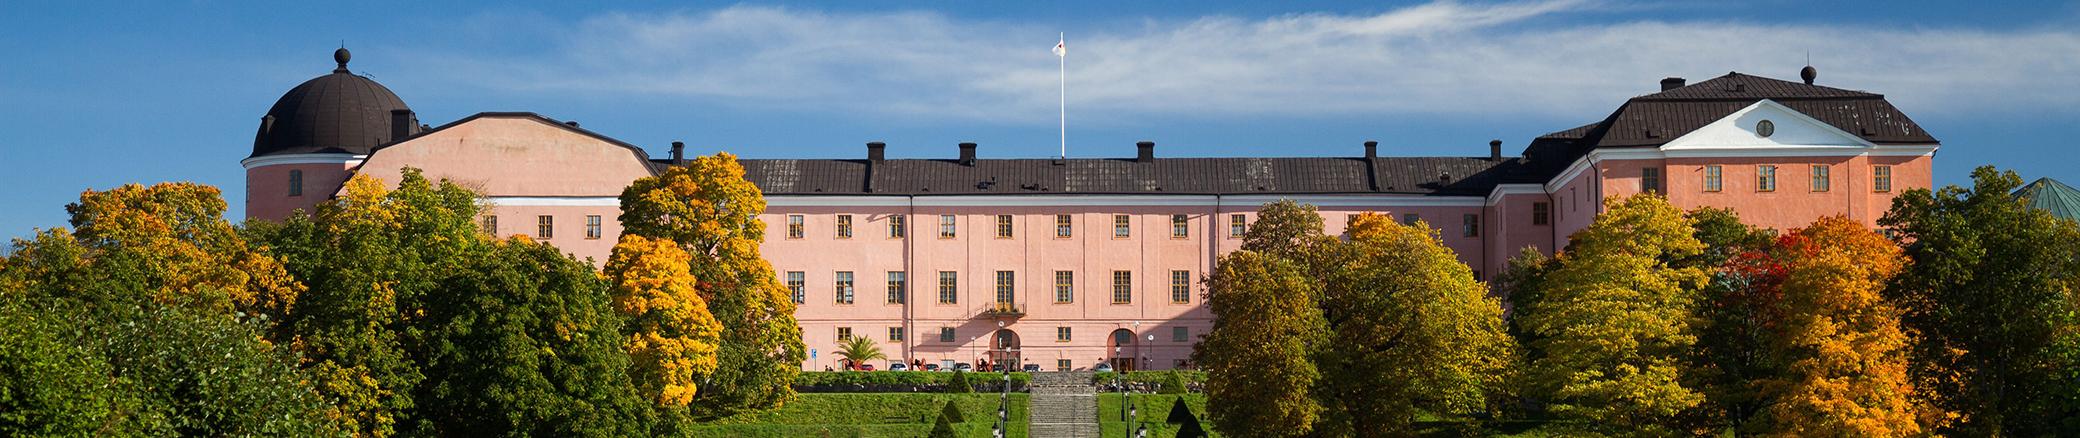 Uppsala castle exterior. Photo.